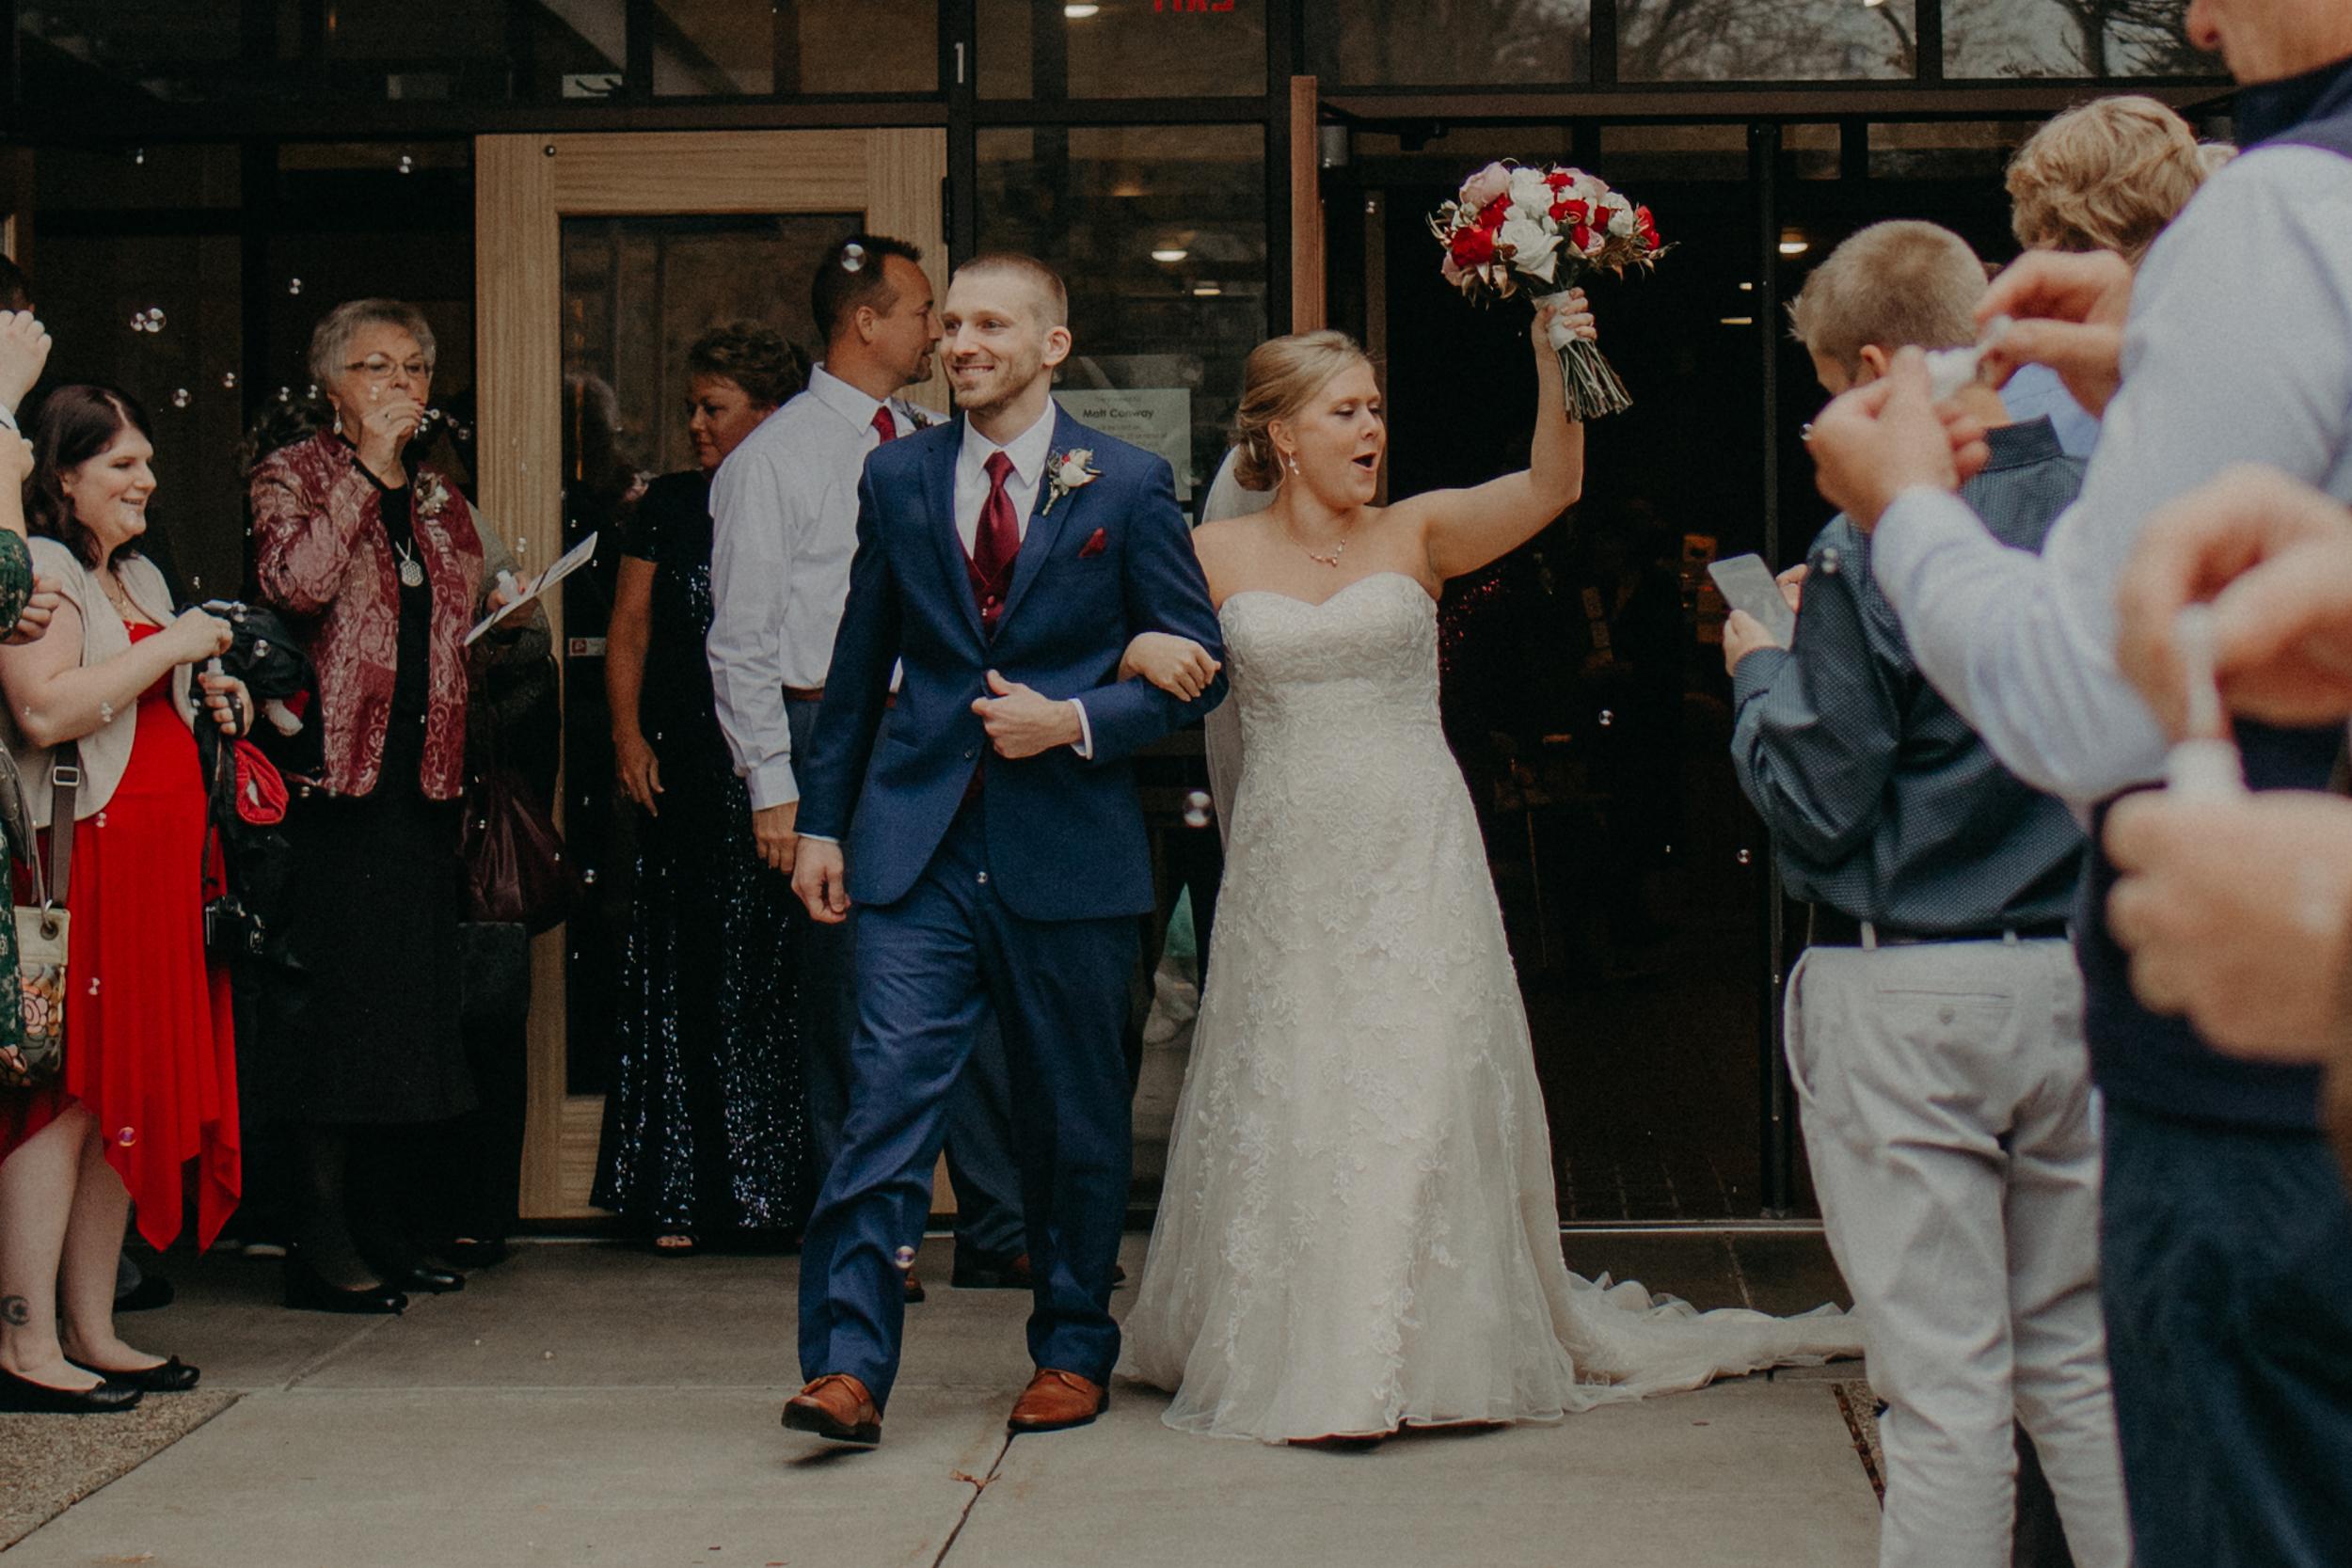 Weisenbeck_Wedding_Oct2018-356.jpg